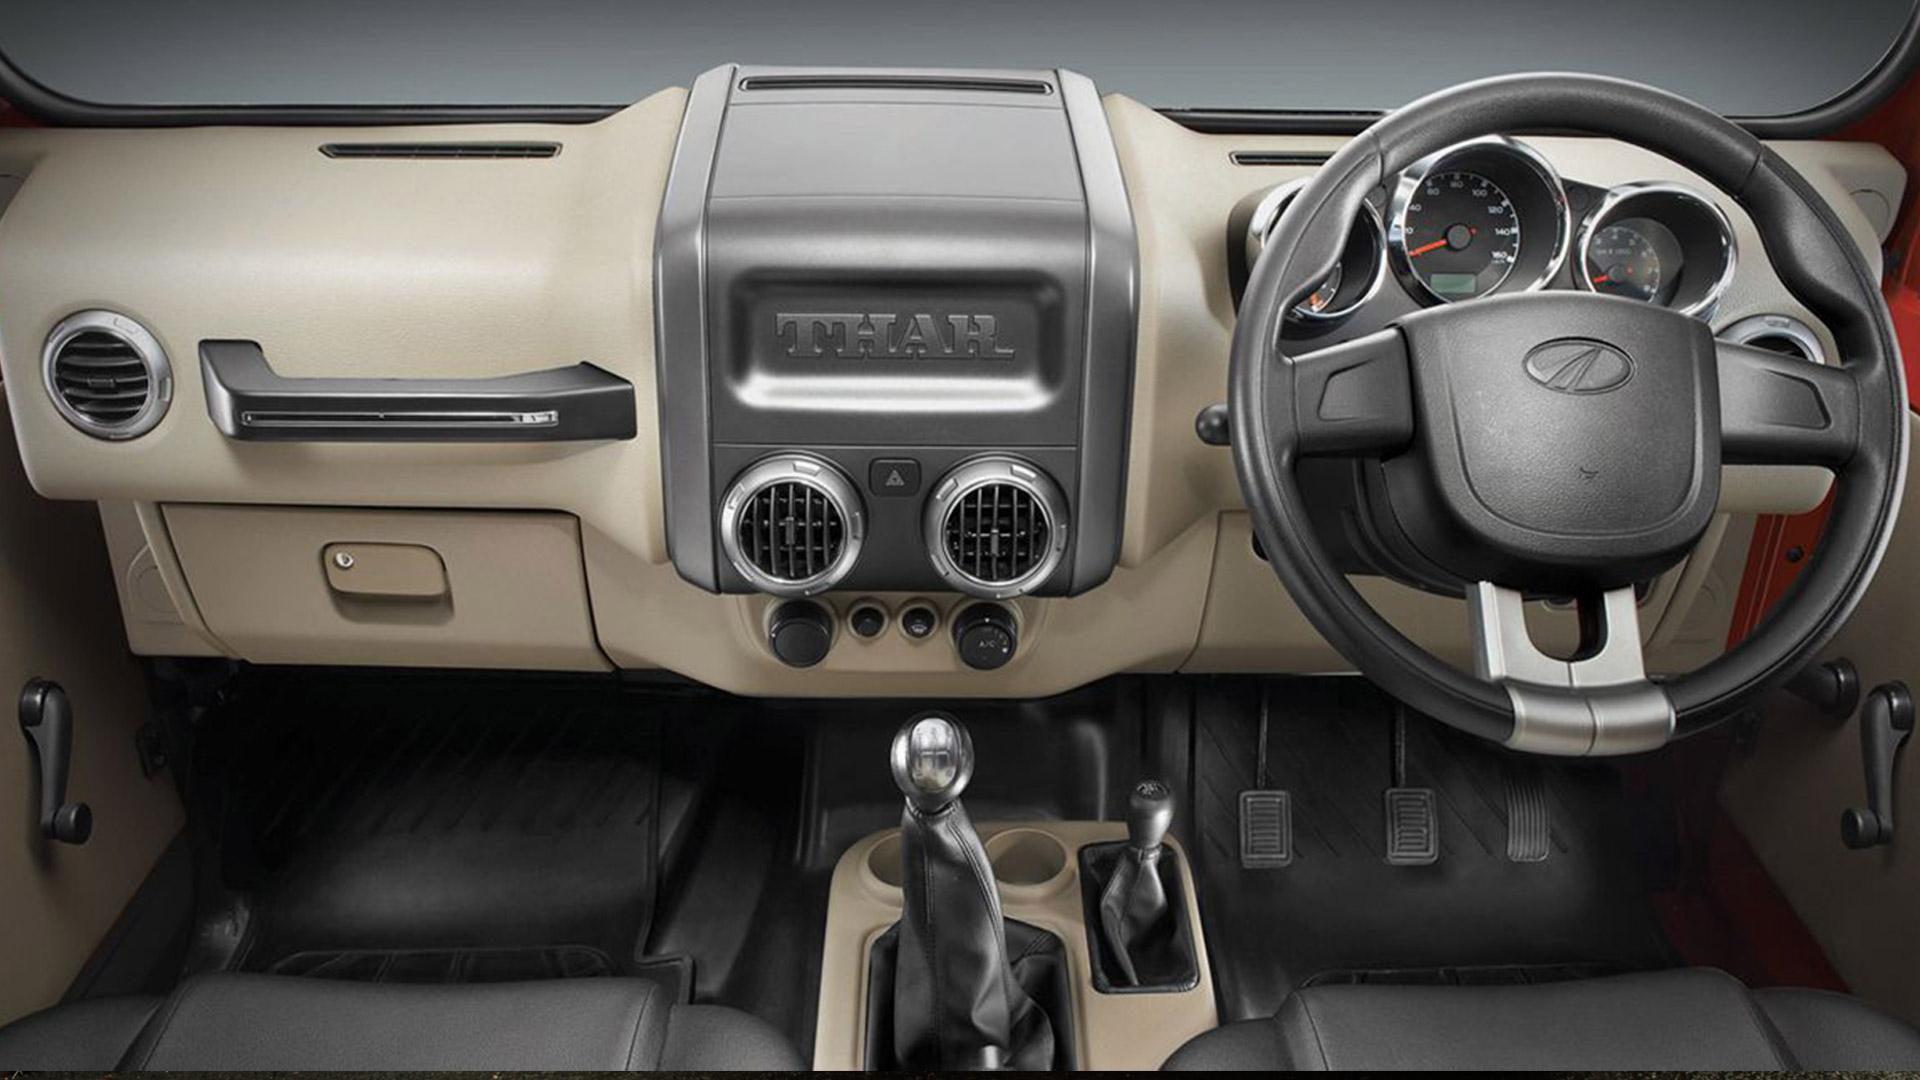 Mahindra Thar 2015 CRDe 4x4 Interior